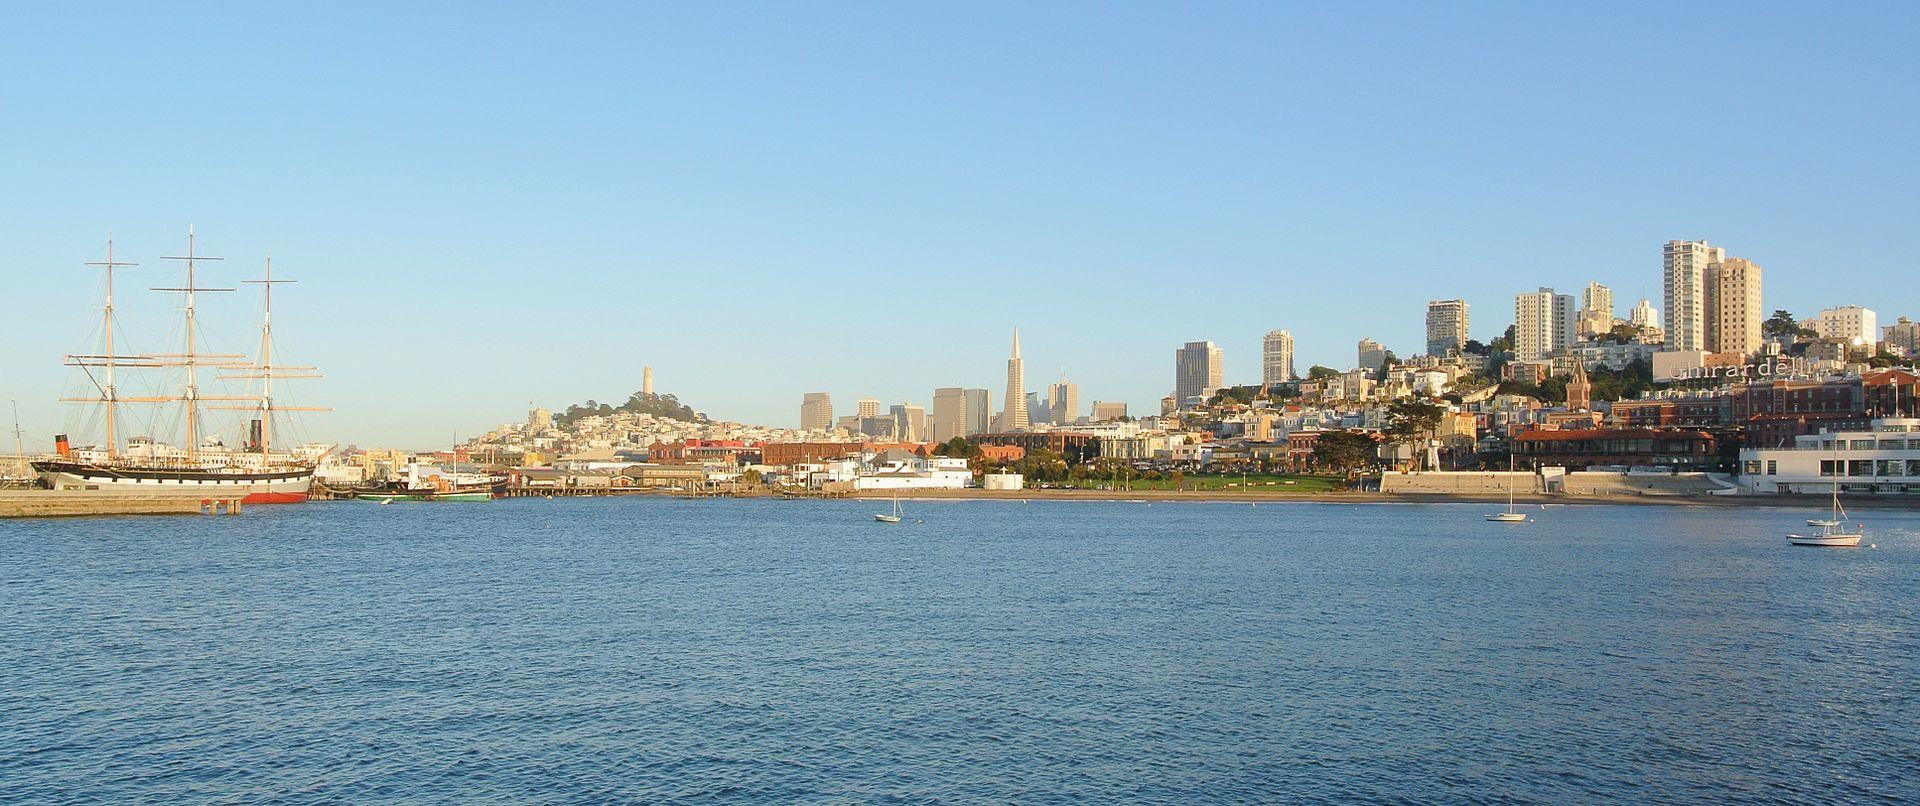 Aquatic_Cove_Cityscape_San_Francisco.jpg